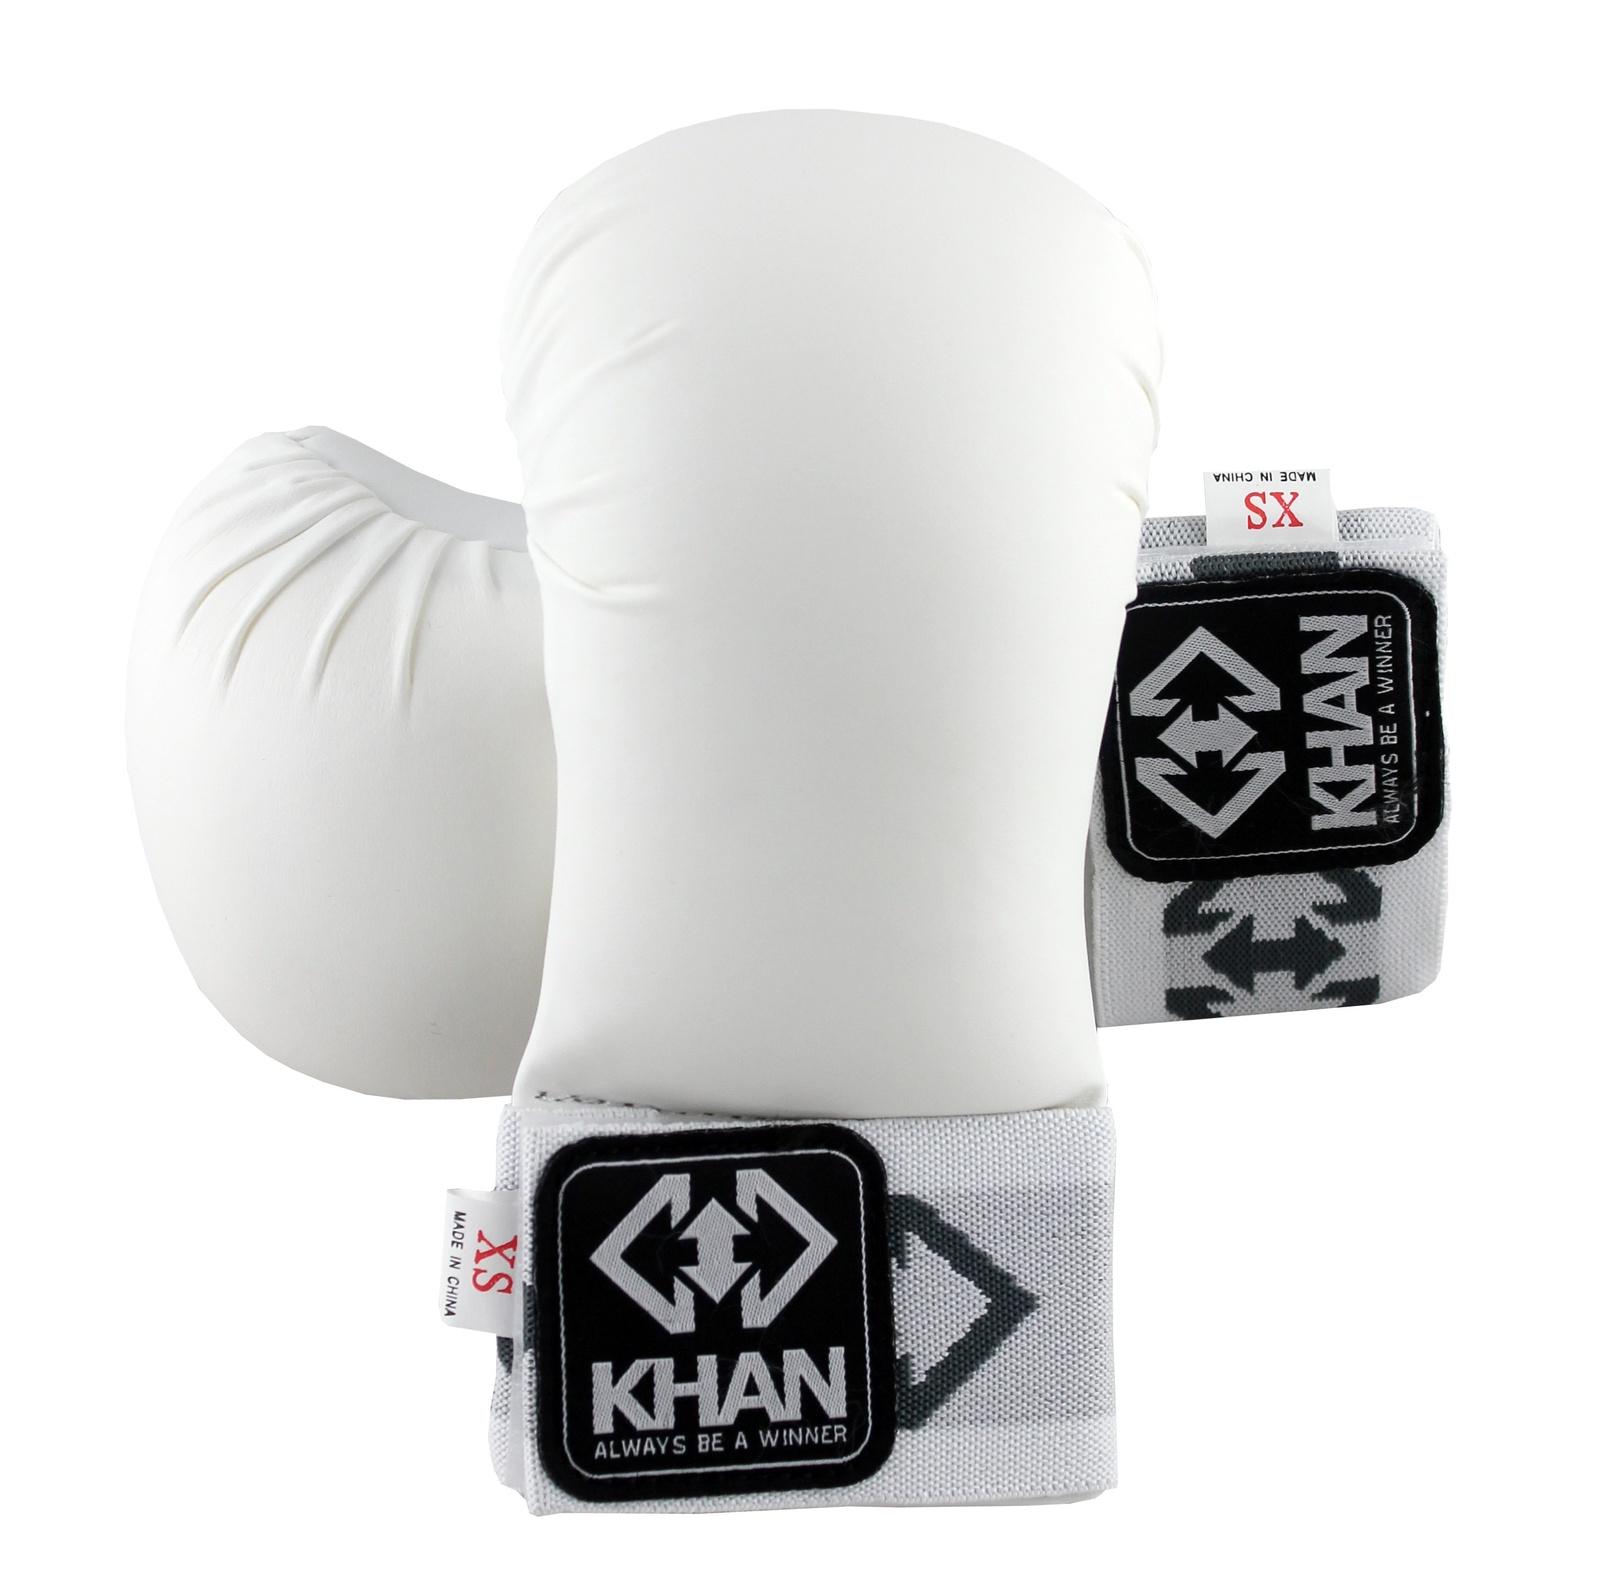 Накладки на кисть Каратэ Khan Shotokan, белый. KG201601-2. Размер S накладки на кисть каратэ khan shotokan белый kg201601 2 размер s